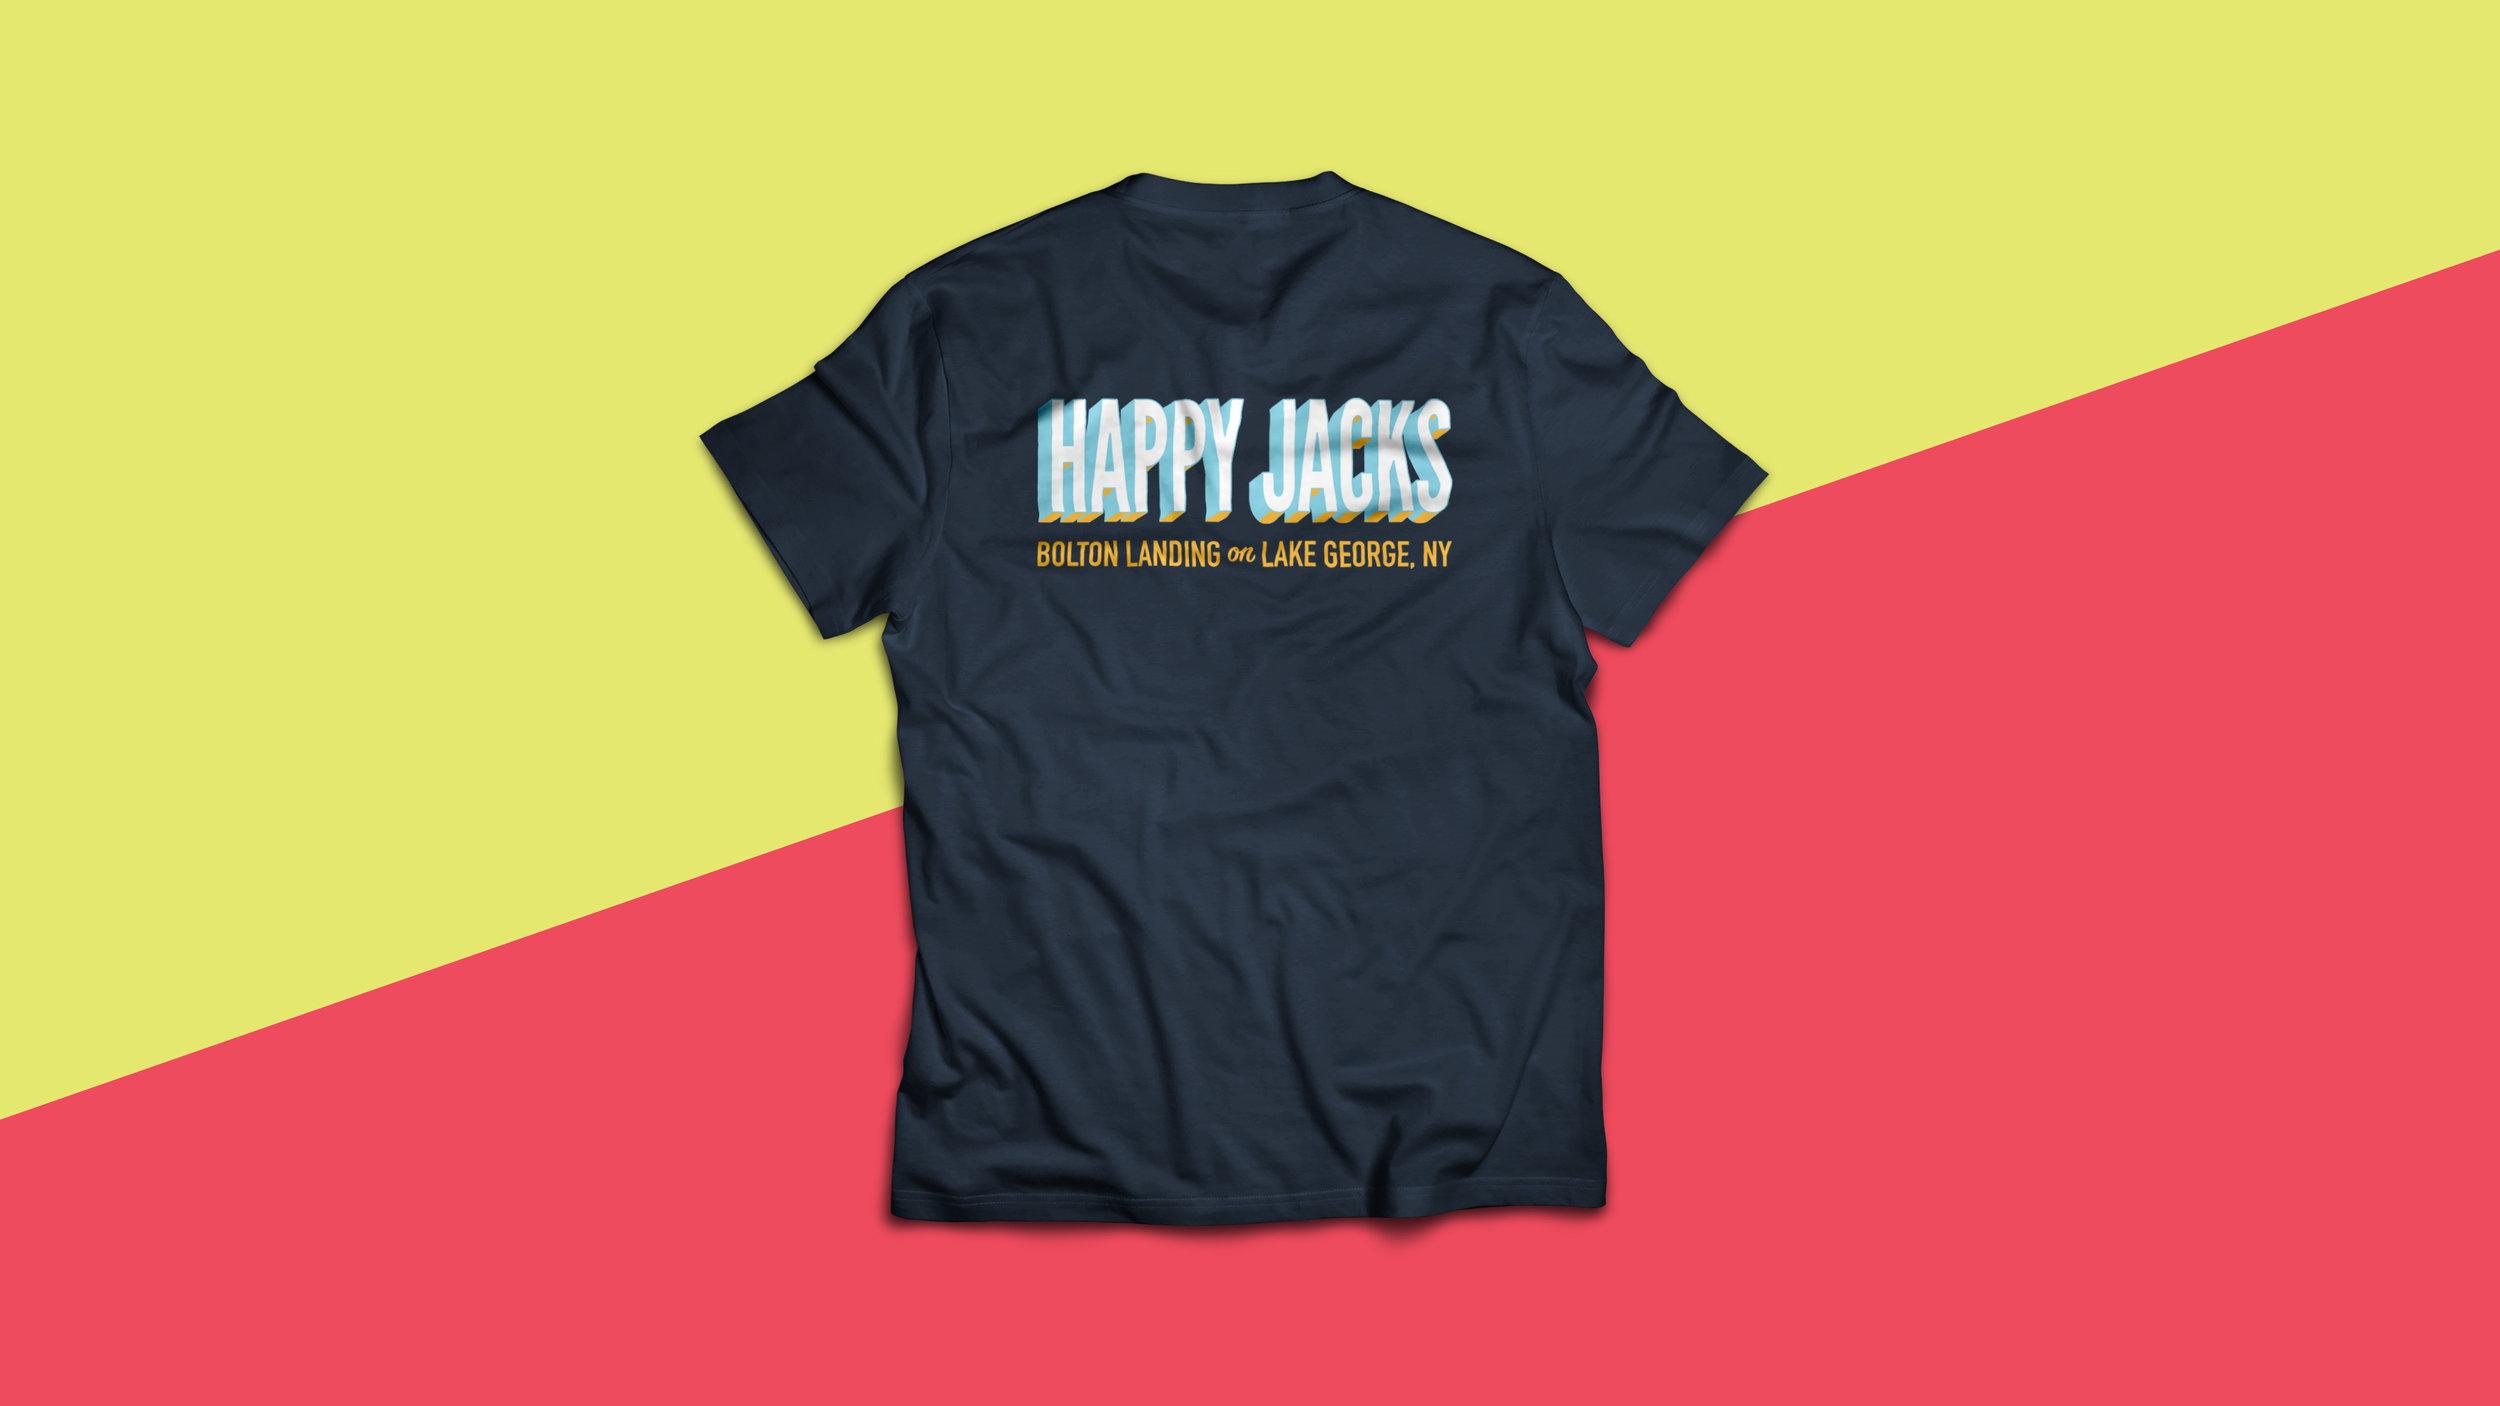 HappyJacks_Tshirt_Mockup.jpg